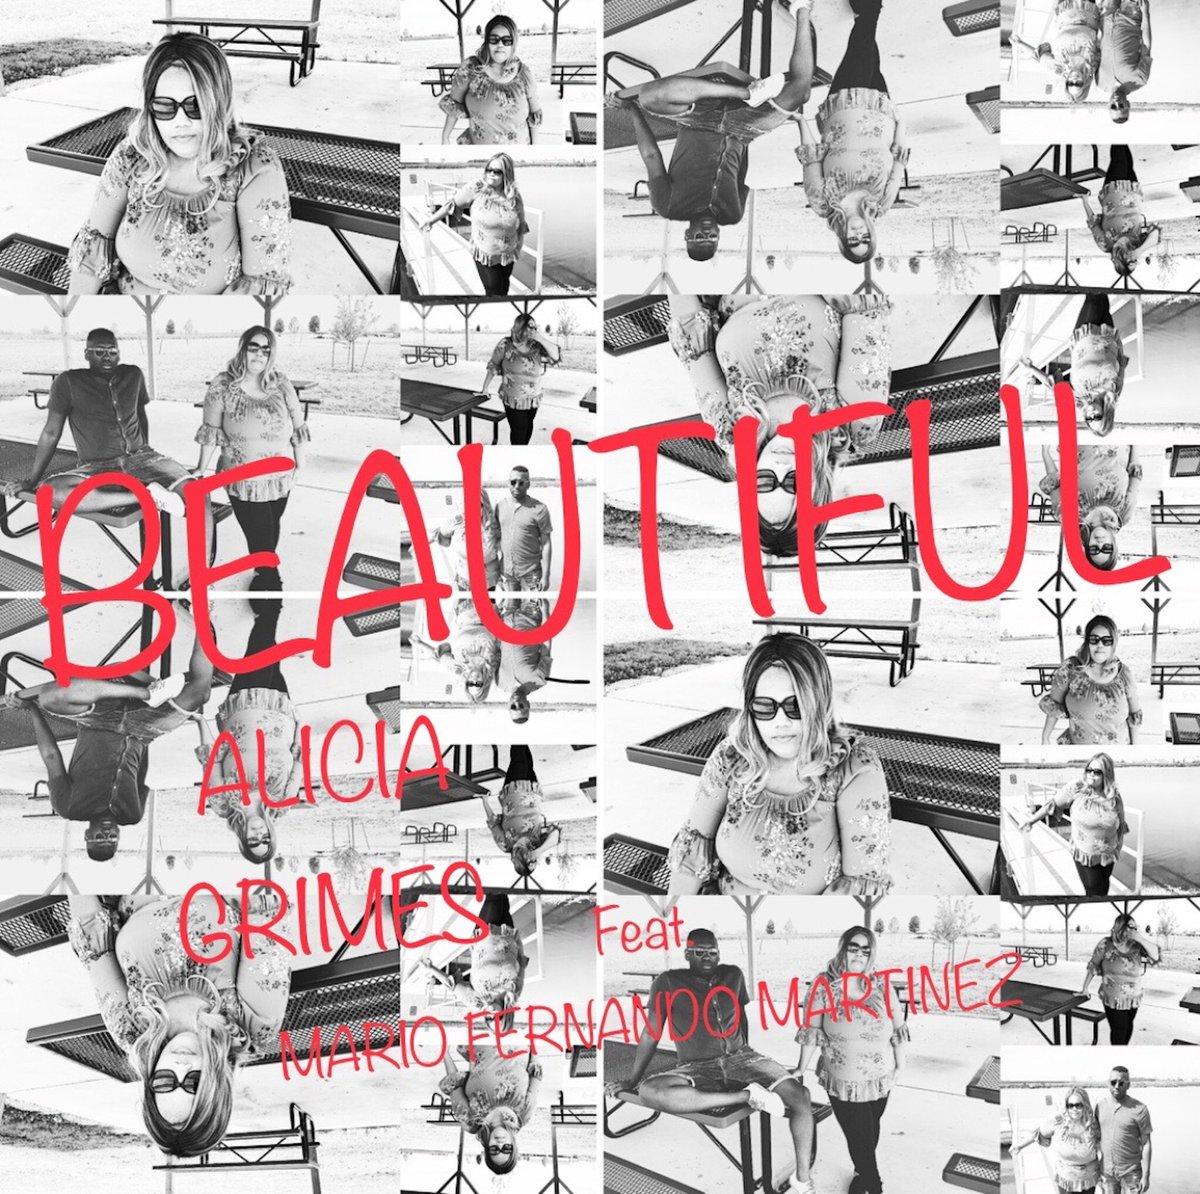 test Twitter Media - #NewMusicFriday #Chicago #Music #Edmdance #popmusic ##edm #release #twittermusic #soundcloud #chicagosuntimes #spinmagazine #chicagomusic #Beautiful is out @ https://t.co/oWKWHdeKsm https://t.co/xXw11ny8Ah